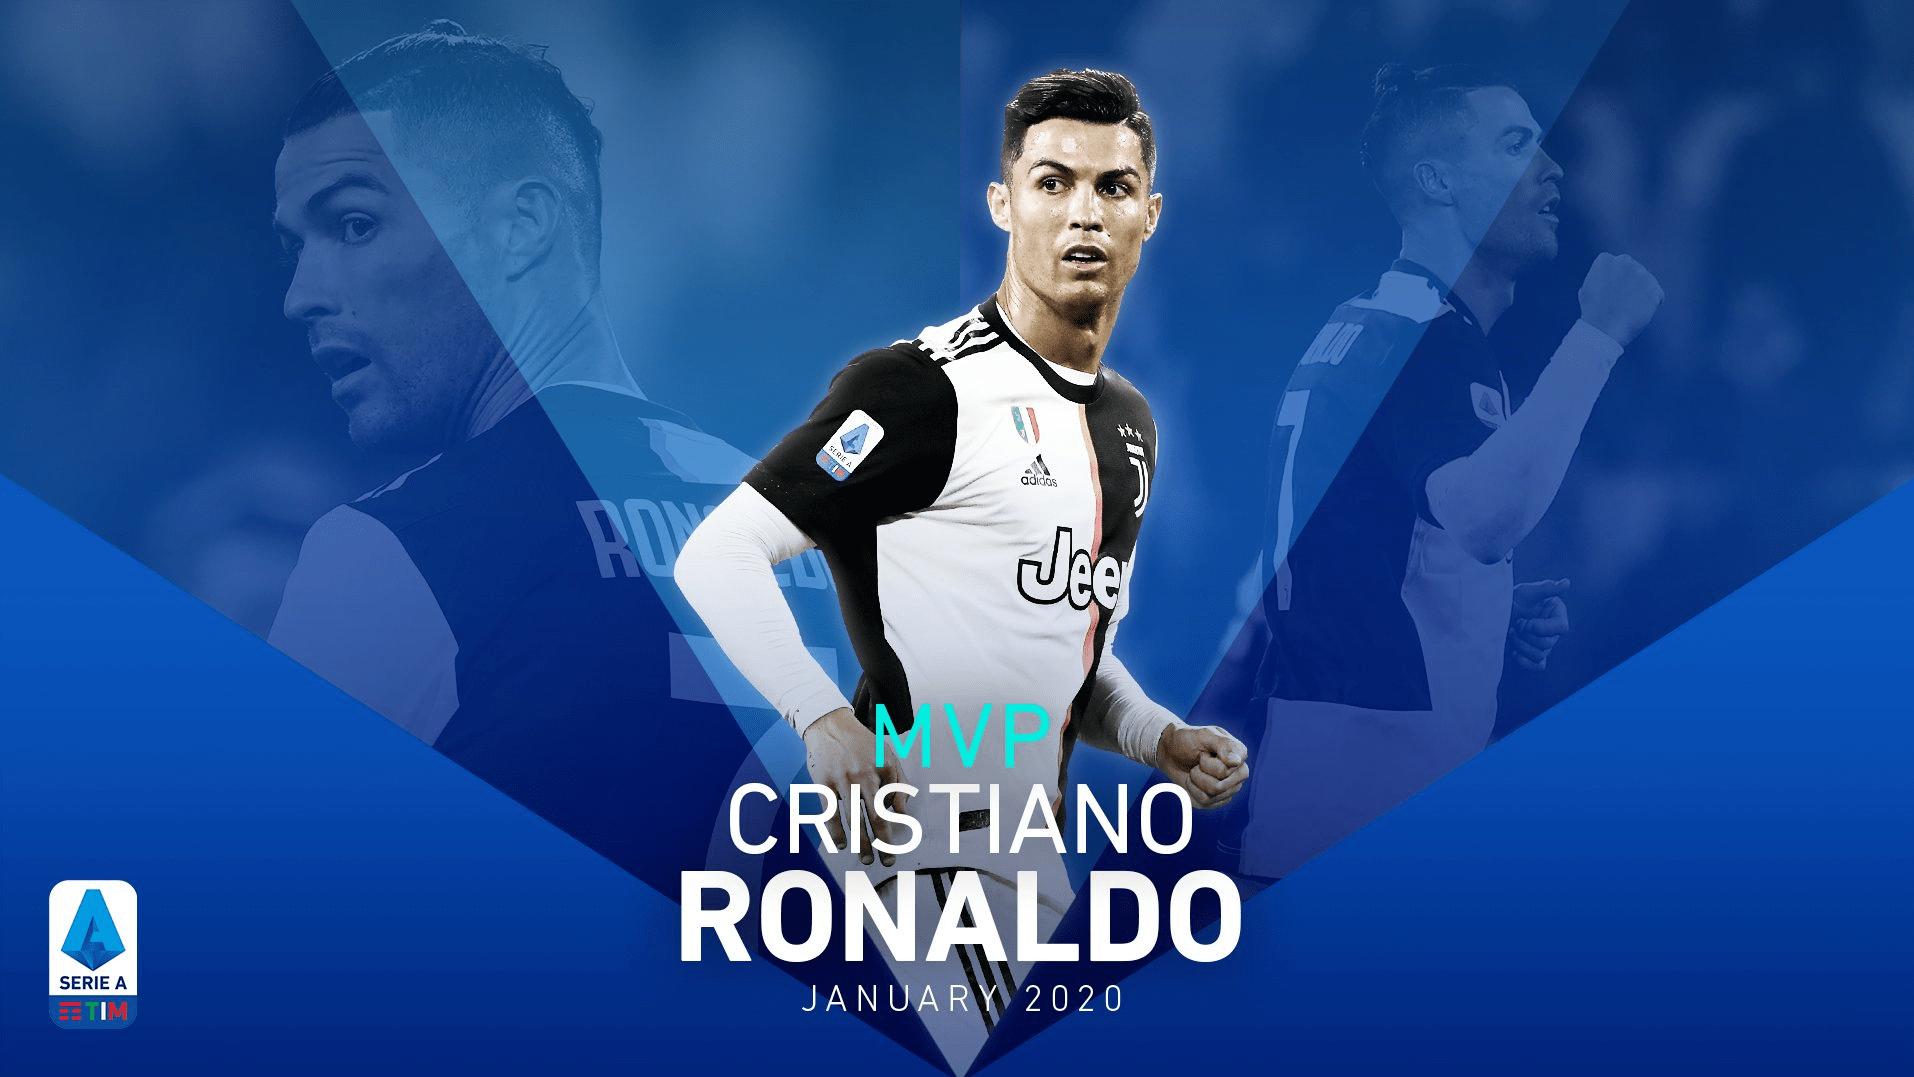 رونالدو - انتخاب کریستیانو رونالدو به حیث بهترین بازیکن ماه لیگ برتر فوتبال ایتالیا